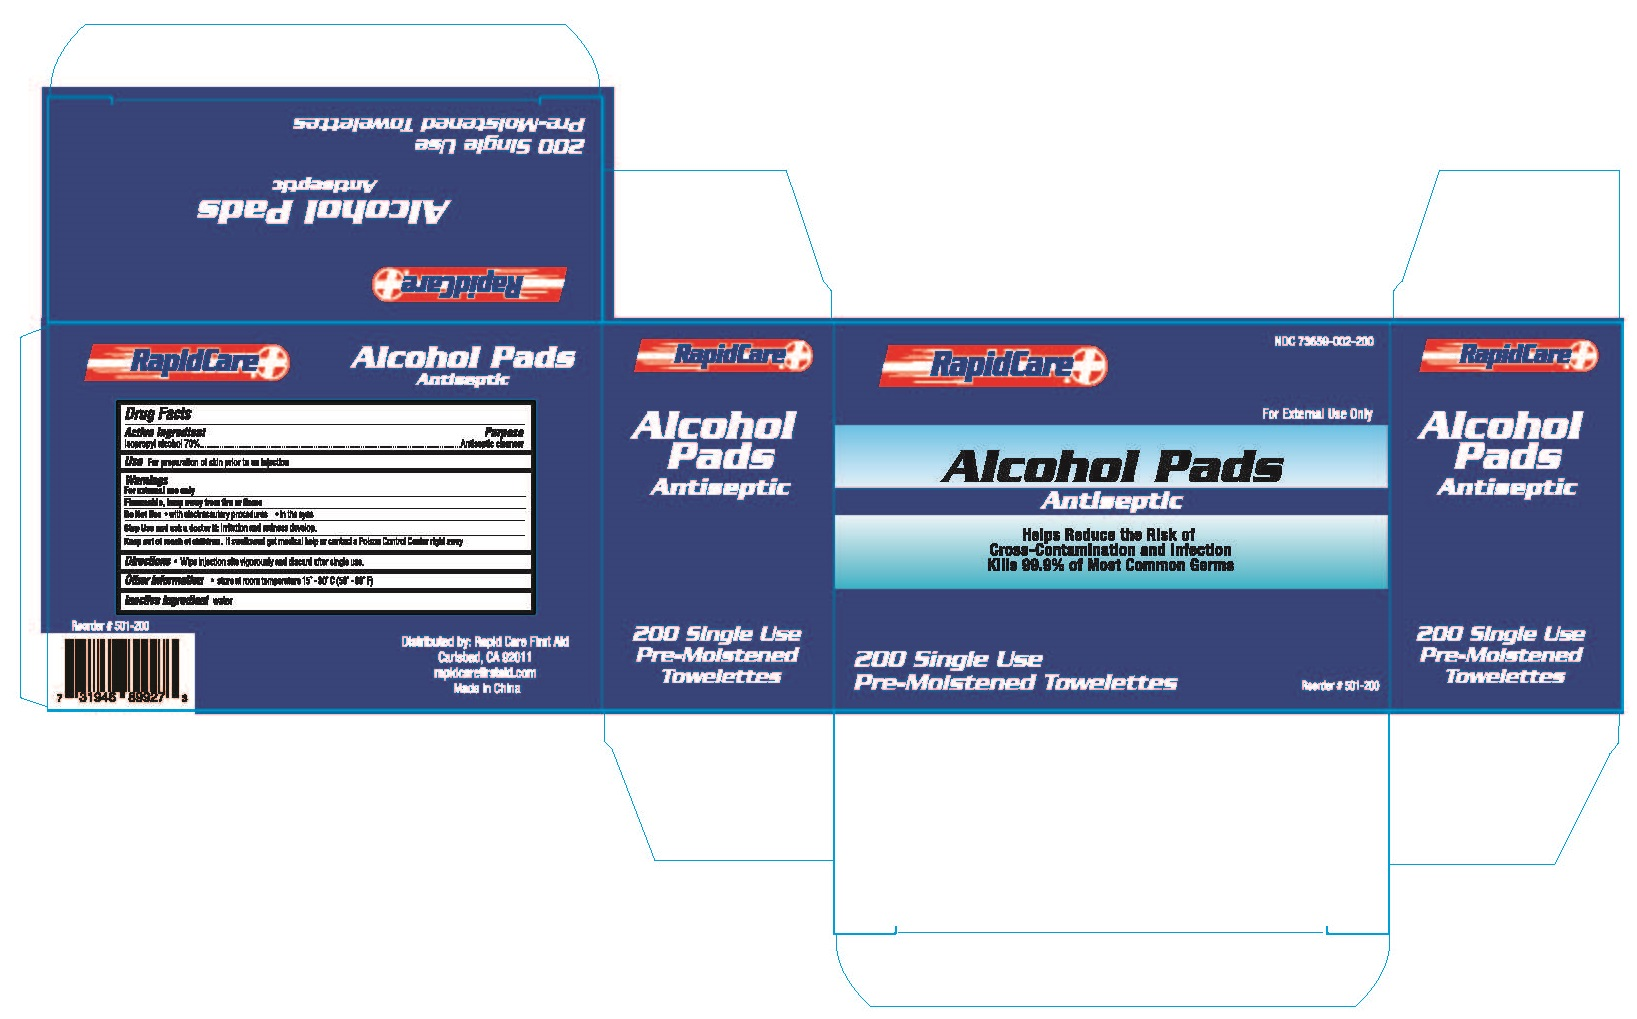 Alcohol Pads 200pcs